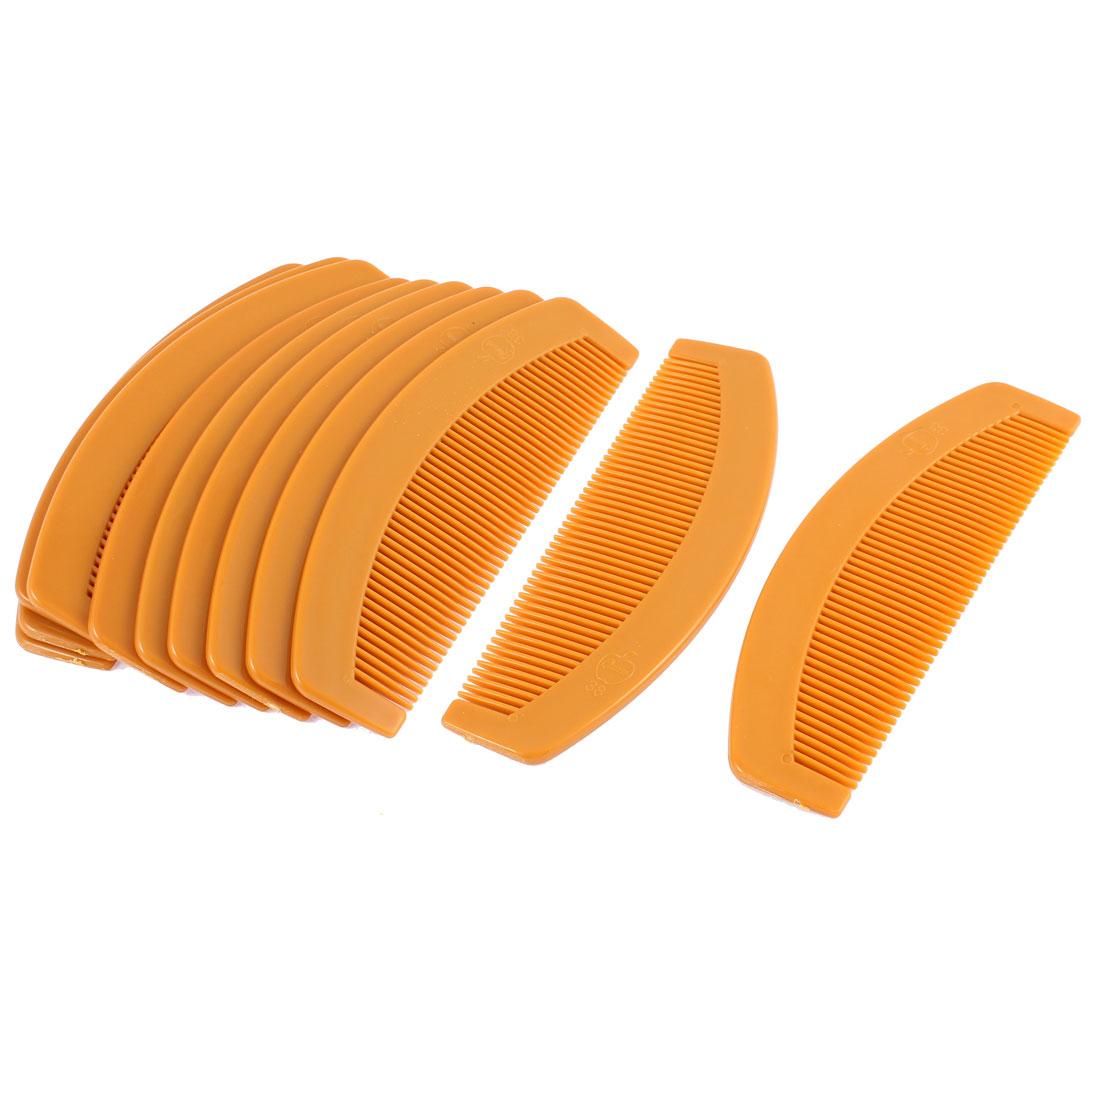 "Women Plastic Hair Care Comb Brown 6"" Length 12Pcs"